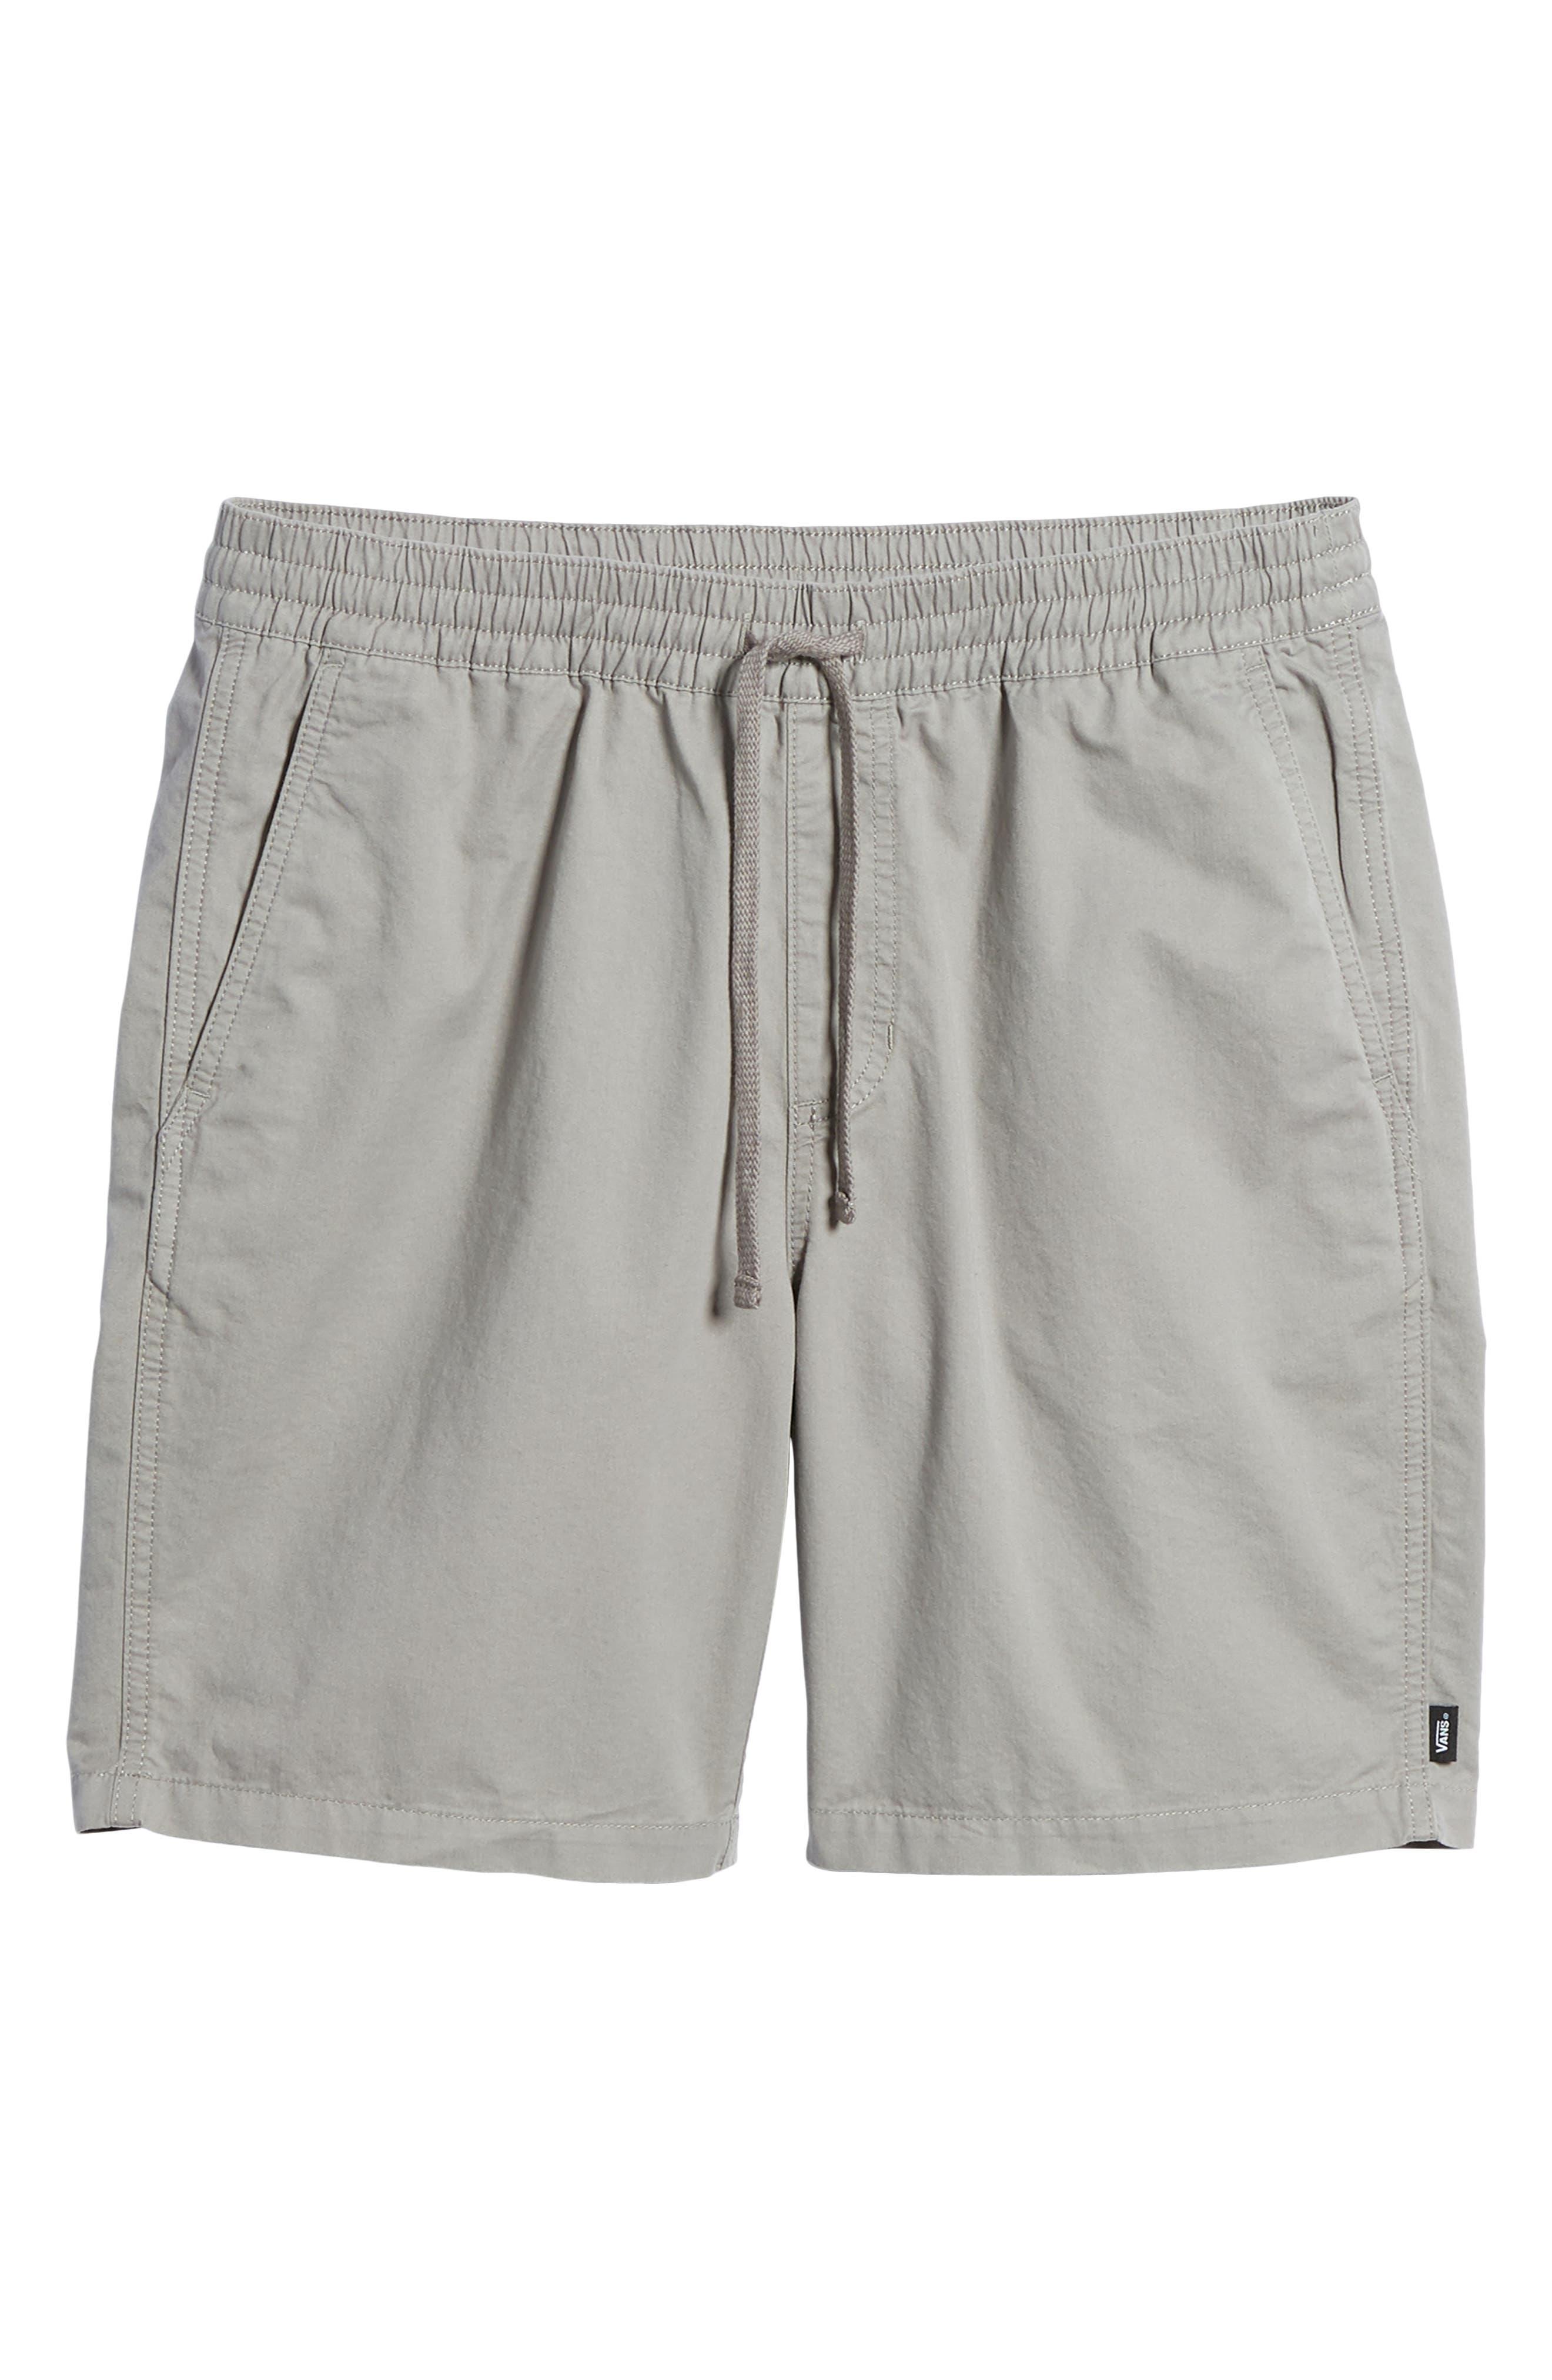 Range Drawstring Shorts,                             Alternate thumbnail 6, color,                             Frost Grey